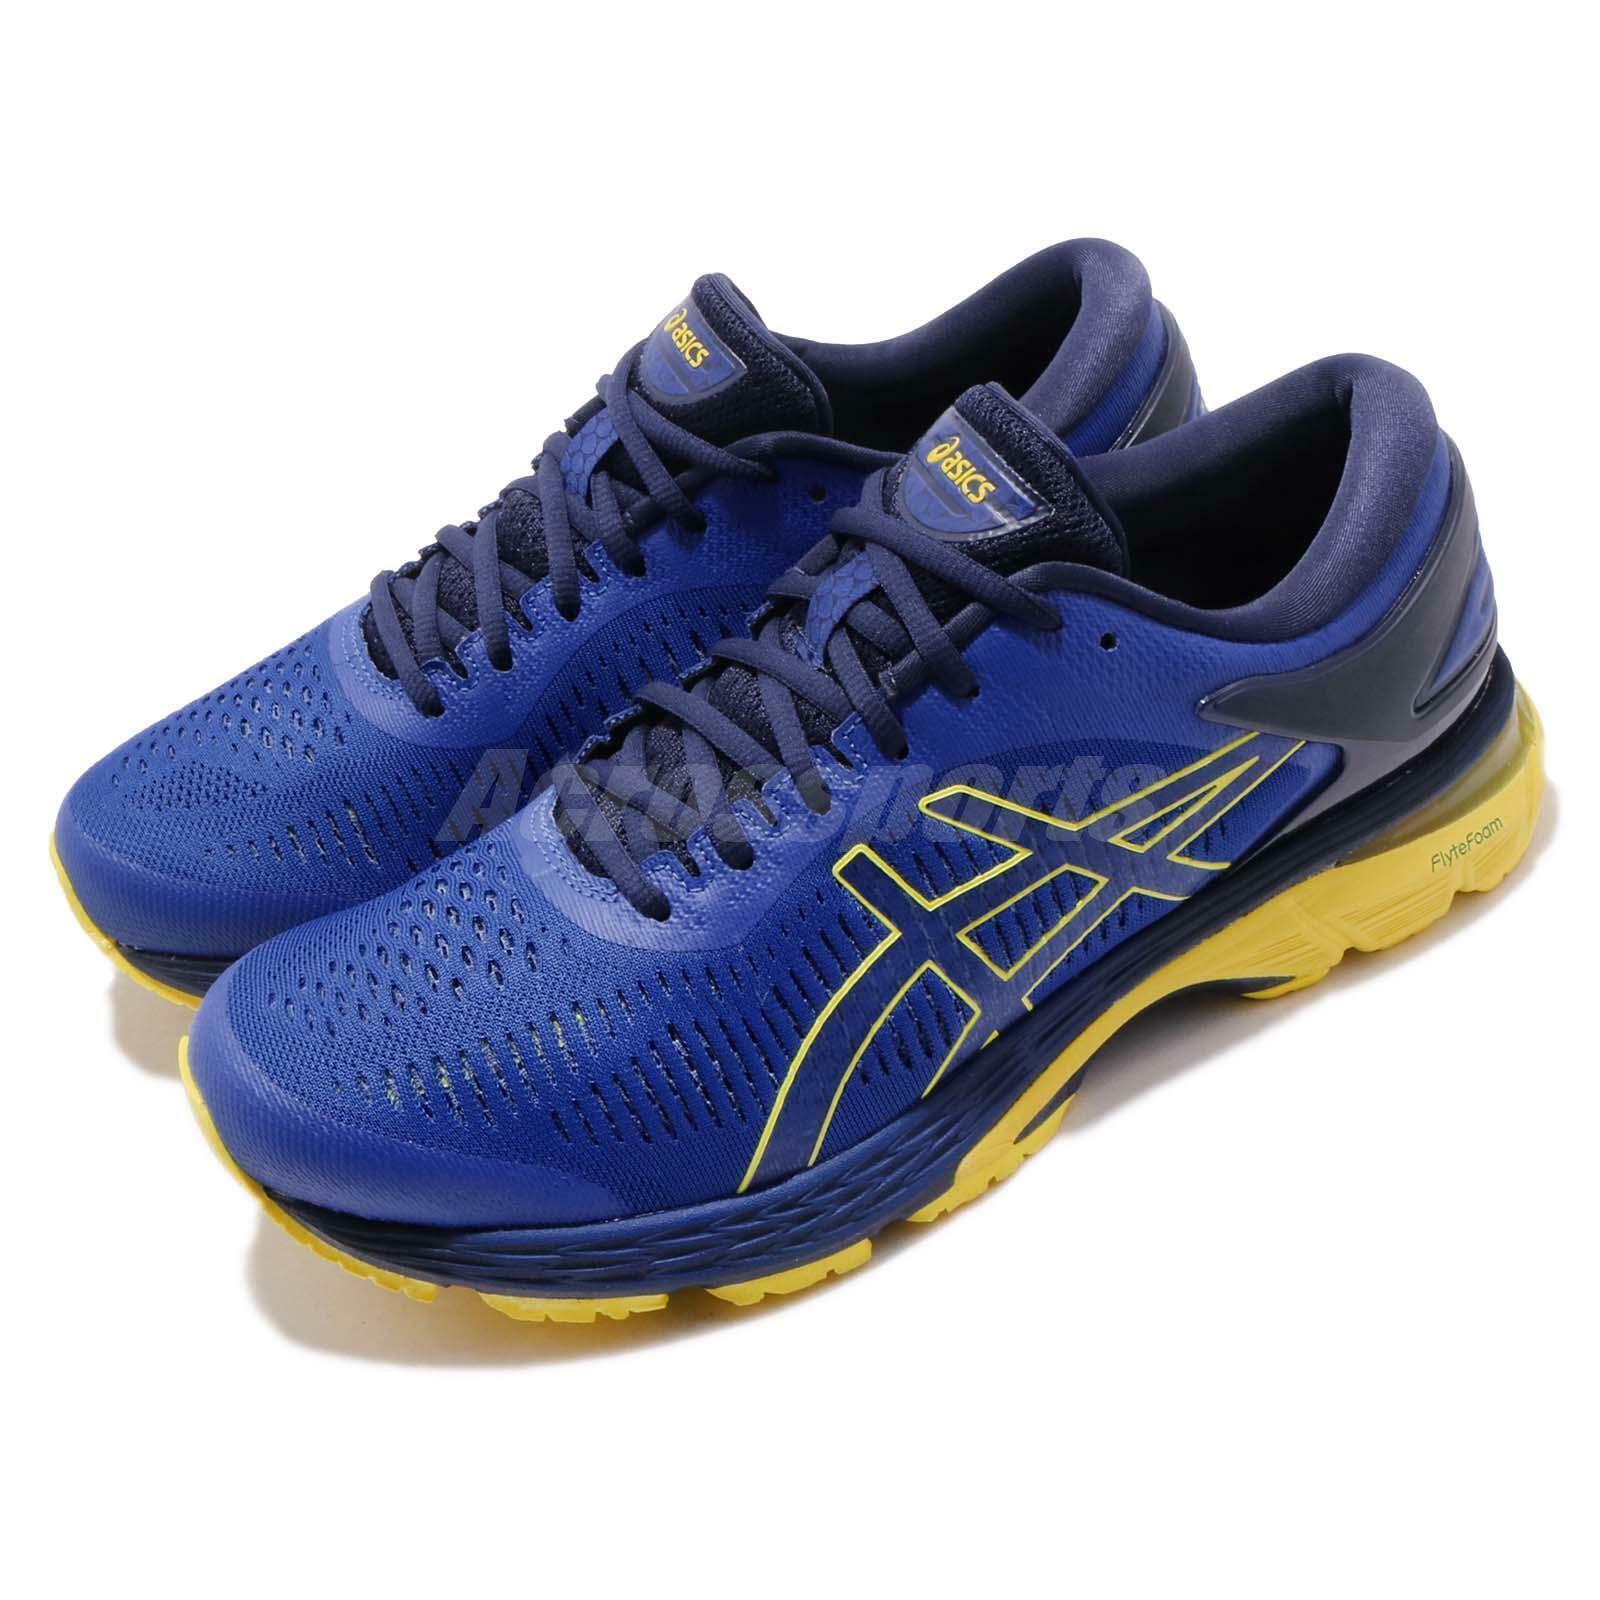 Asics Gel Kayano 25 blu Lemon Spark Men Running scarpe  scarpe da ginnastica 1011A019 -401  vendendo bene in tutto il mondo